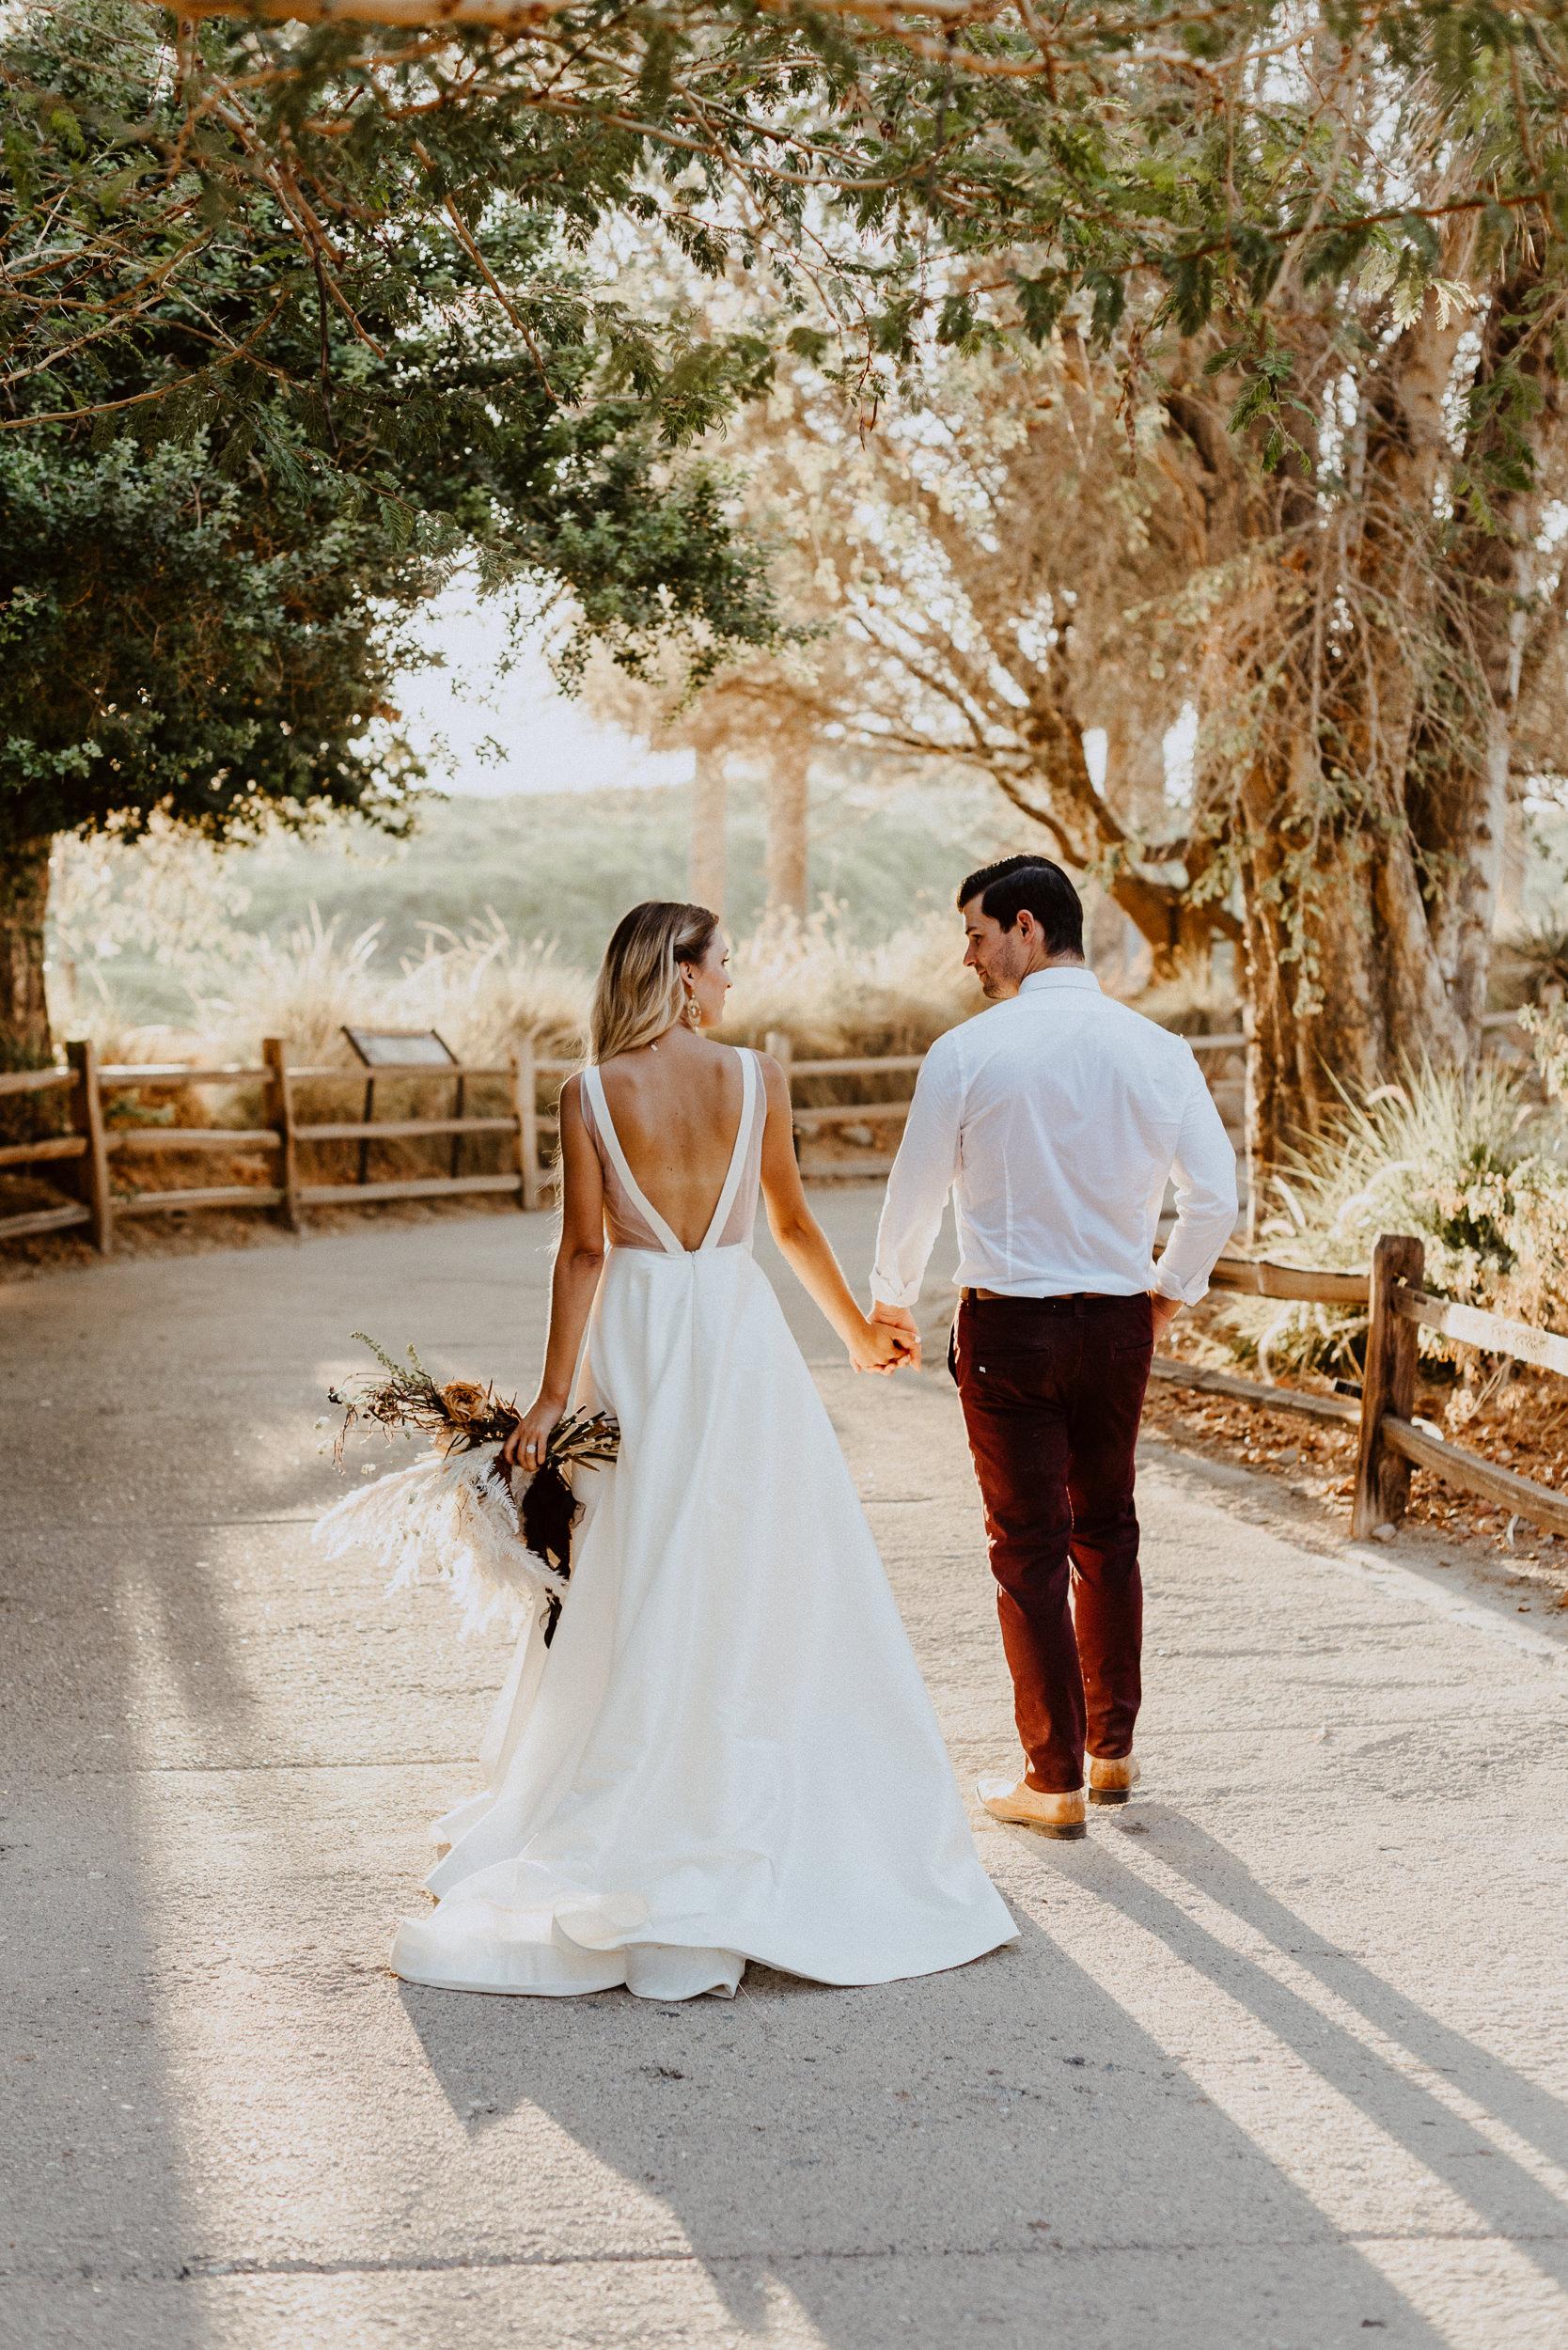 sChelsie + Chris - The Desert Shootout Wedding Romantics at The Living Desert-136.jpg